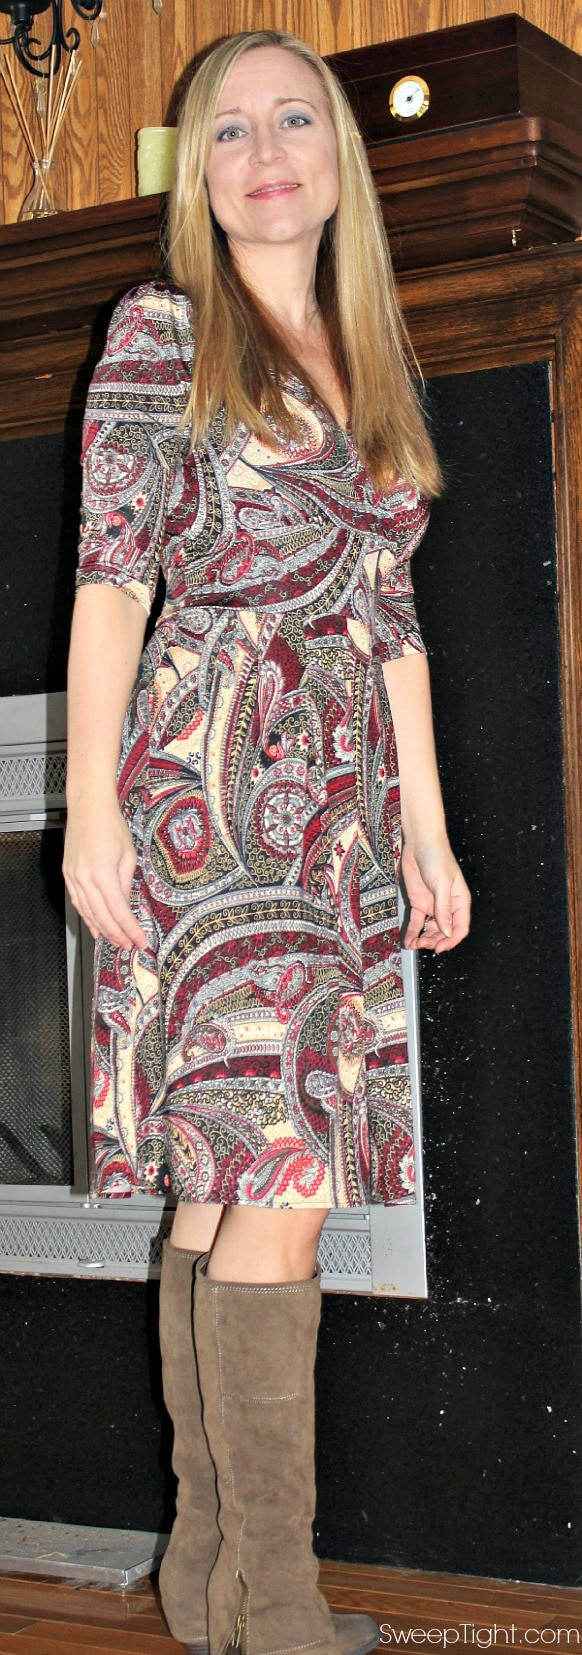 More Paisley Fun with Karina Dresses